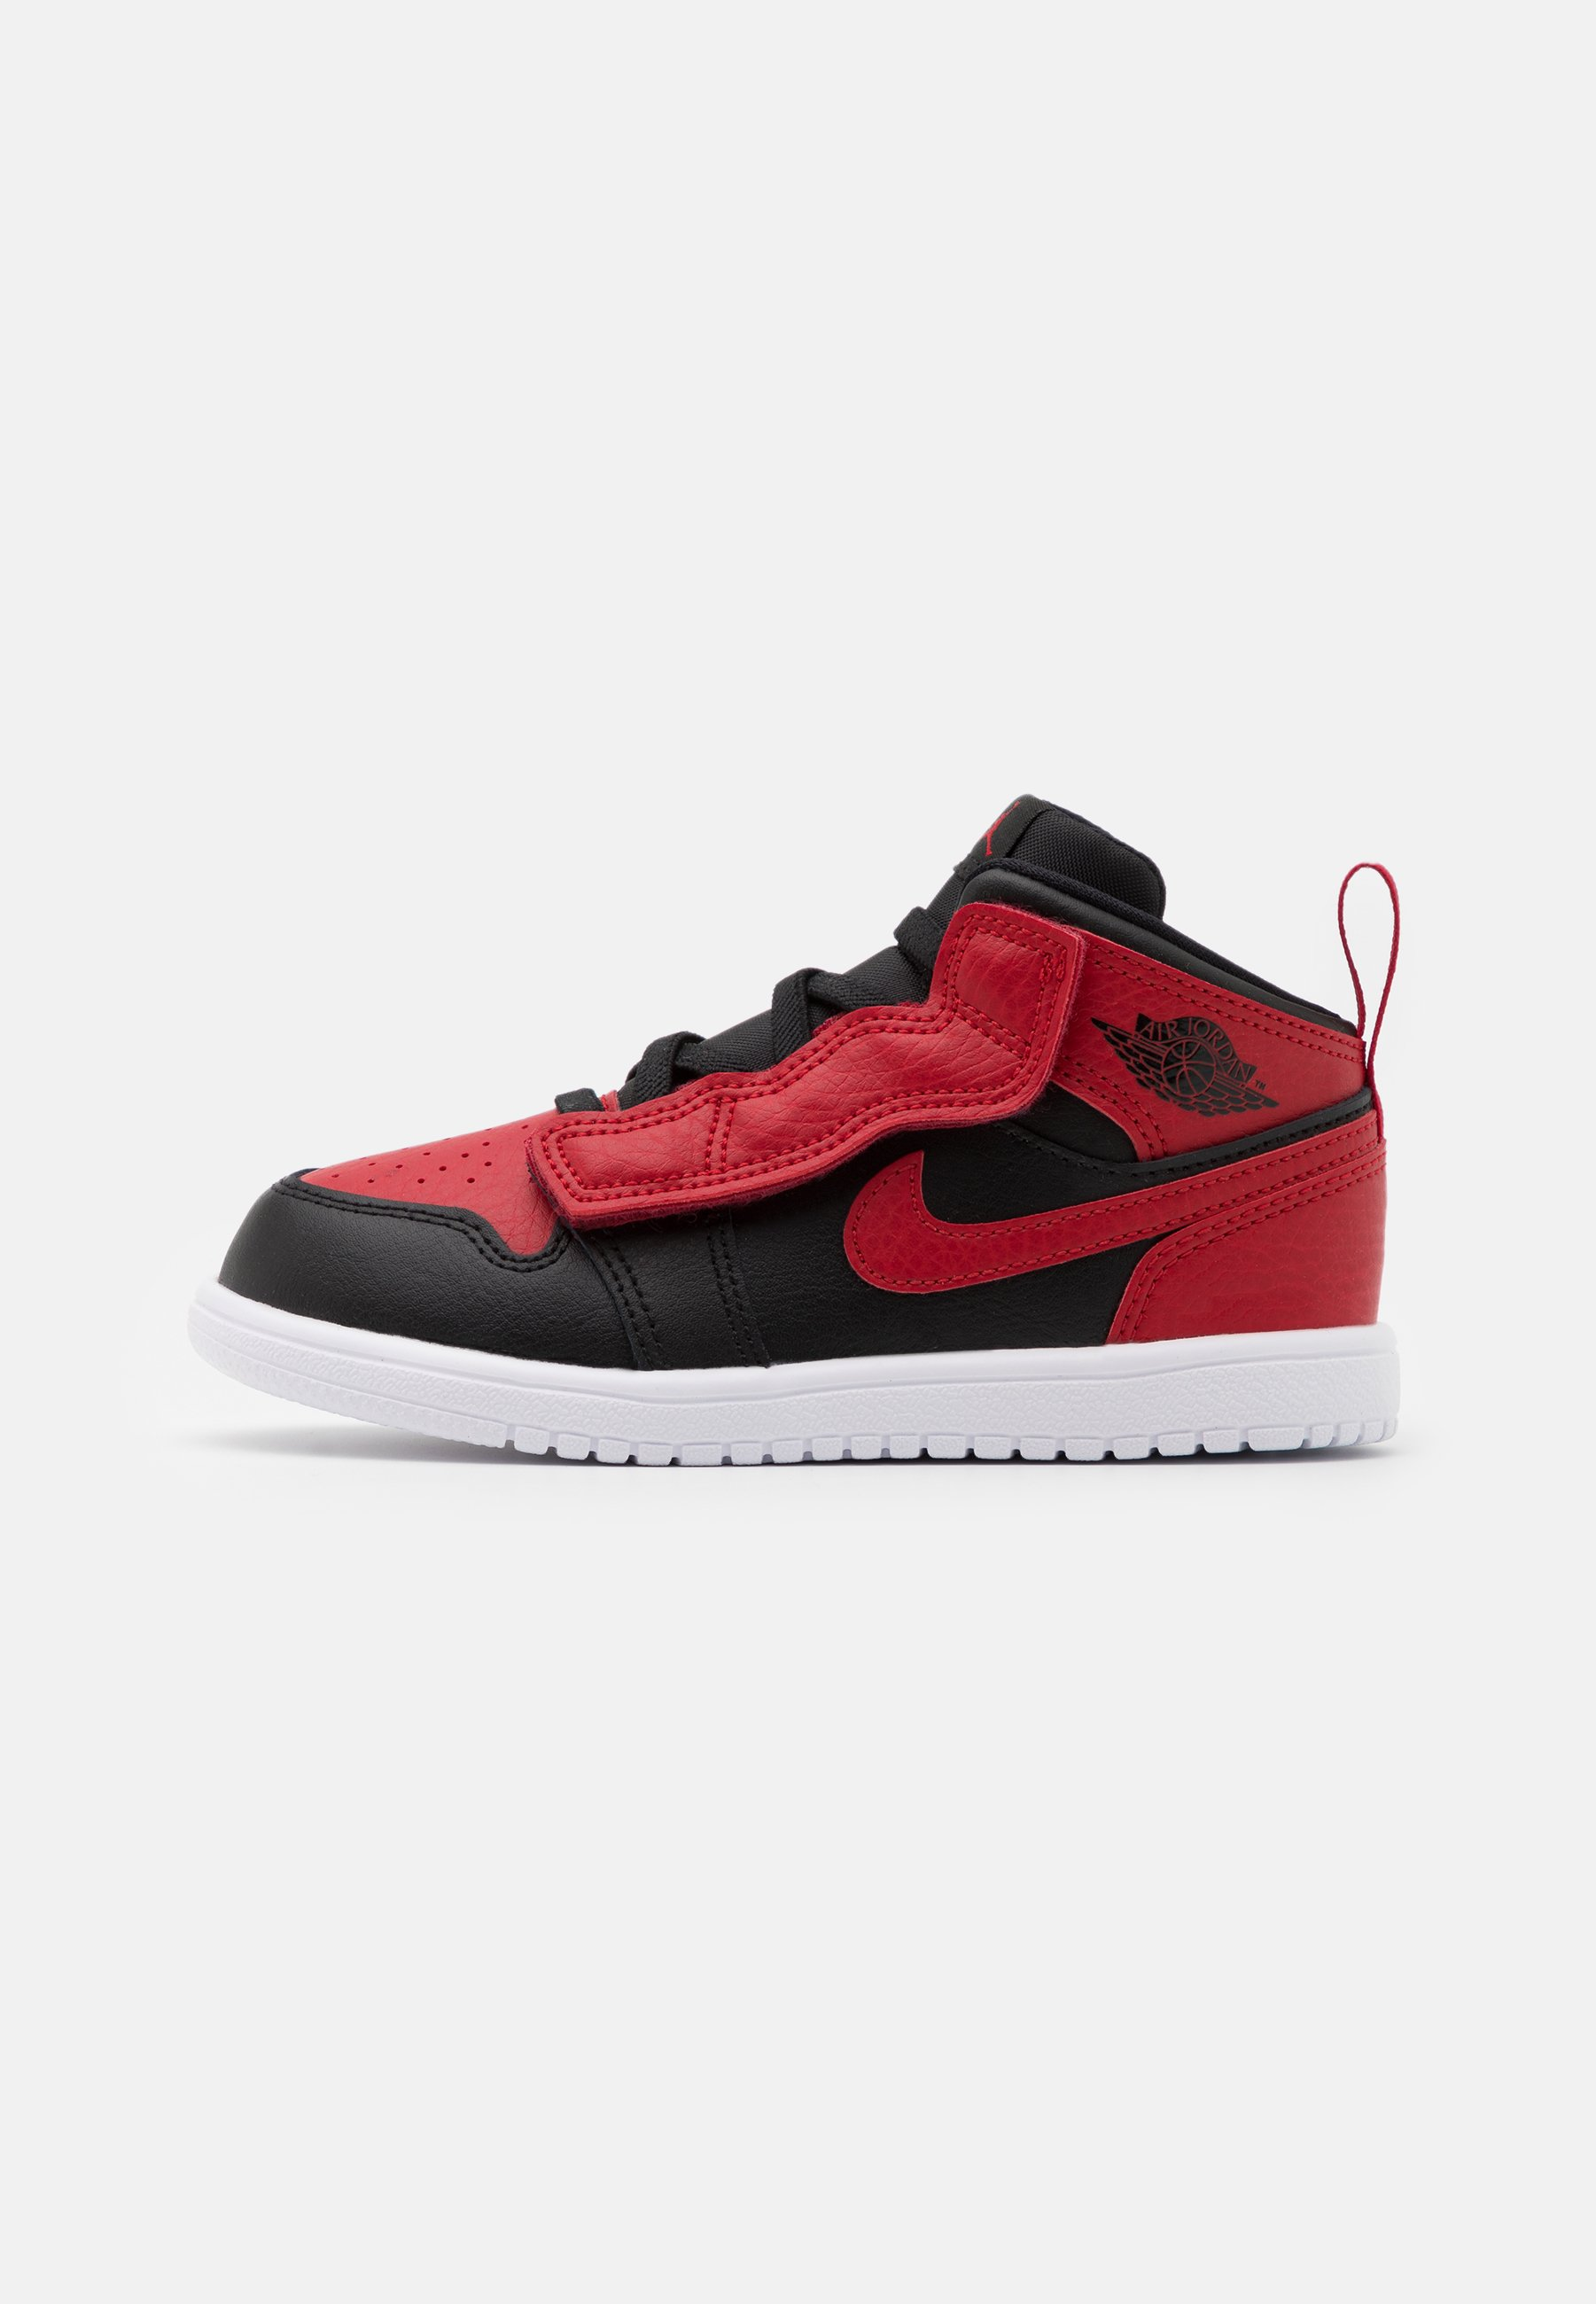 1 MID UNISEX - Chaussures de basket - black/gym red/white